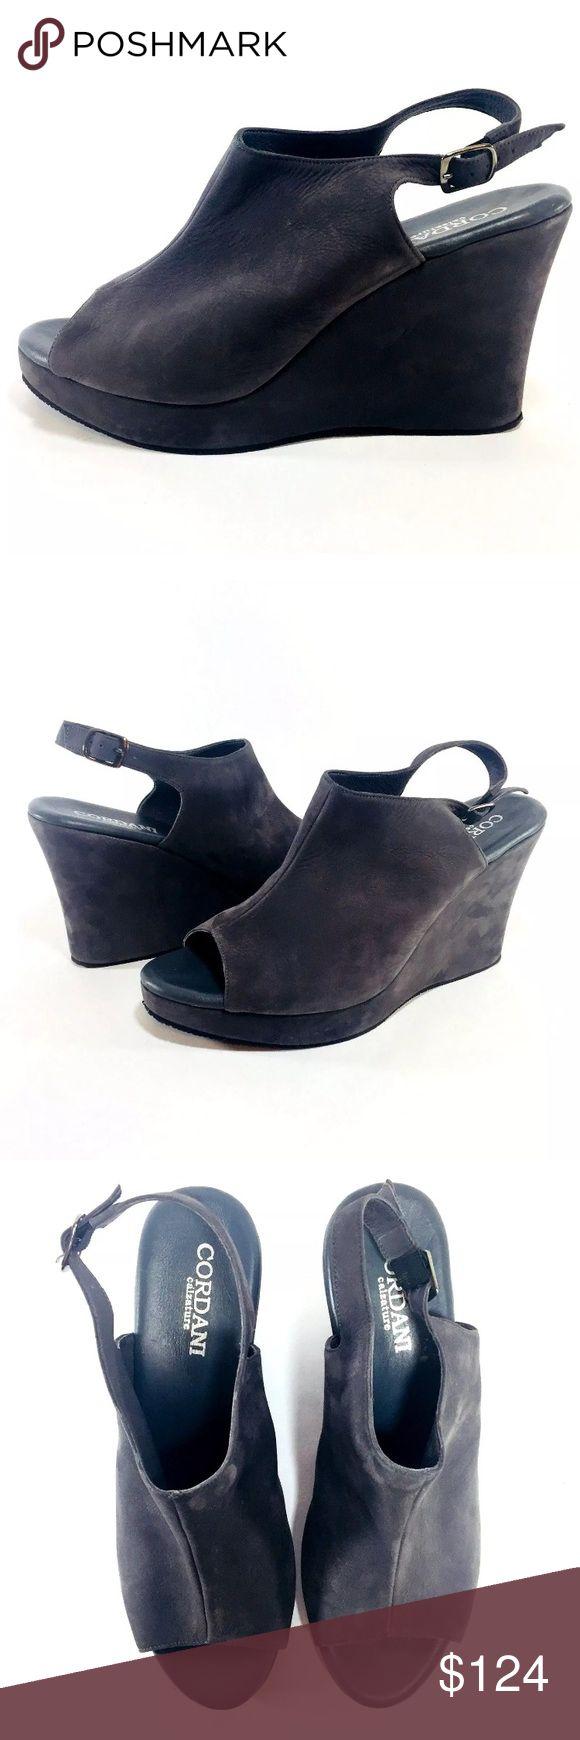 Cordani Wellesley Charcoal Gray Wedge Size 40/9 Charcoal Gray Nubuck Suede ankle strap peep toe wedge. Size 40/9US Cordani Shoes Wedges